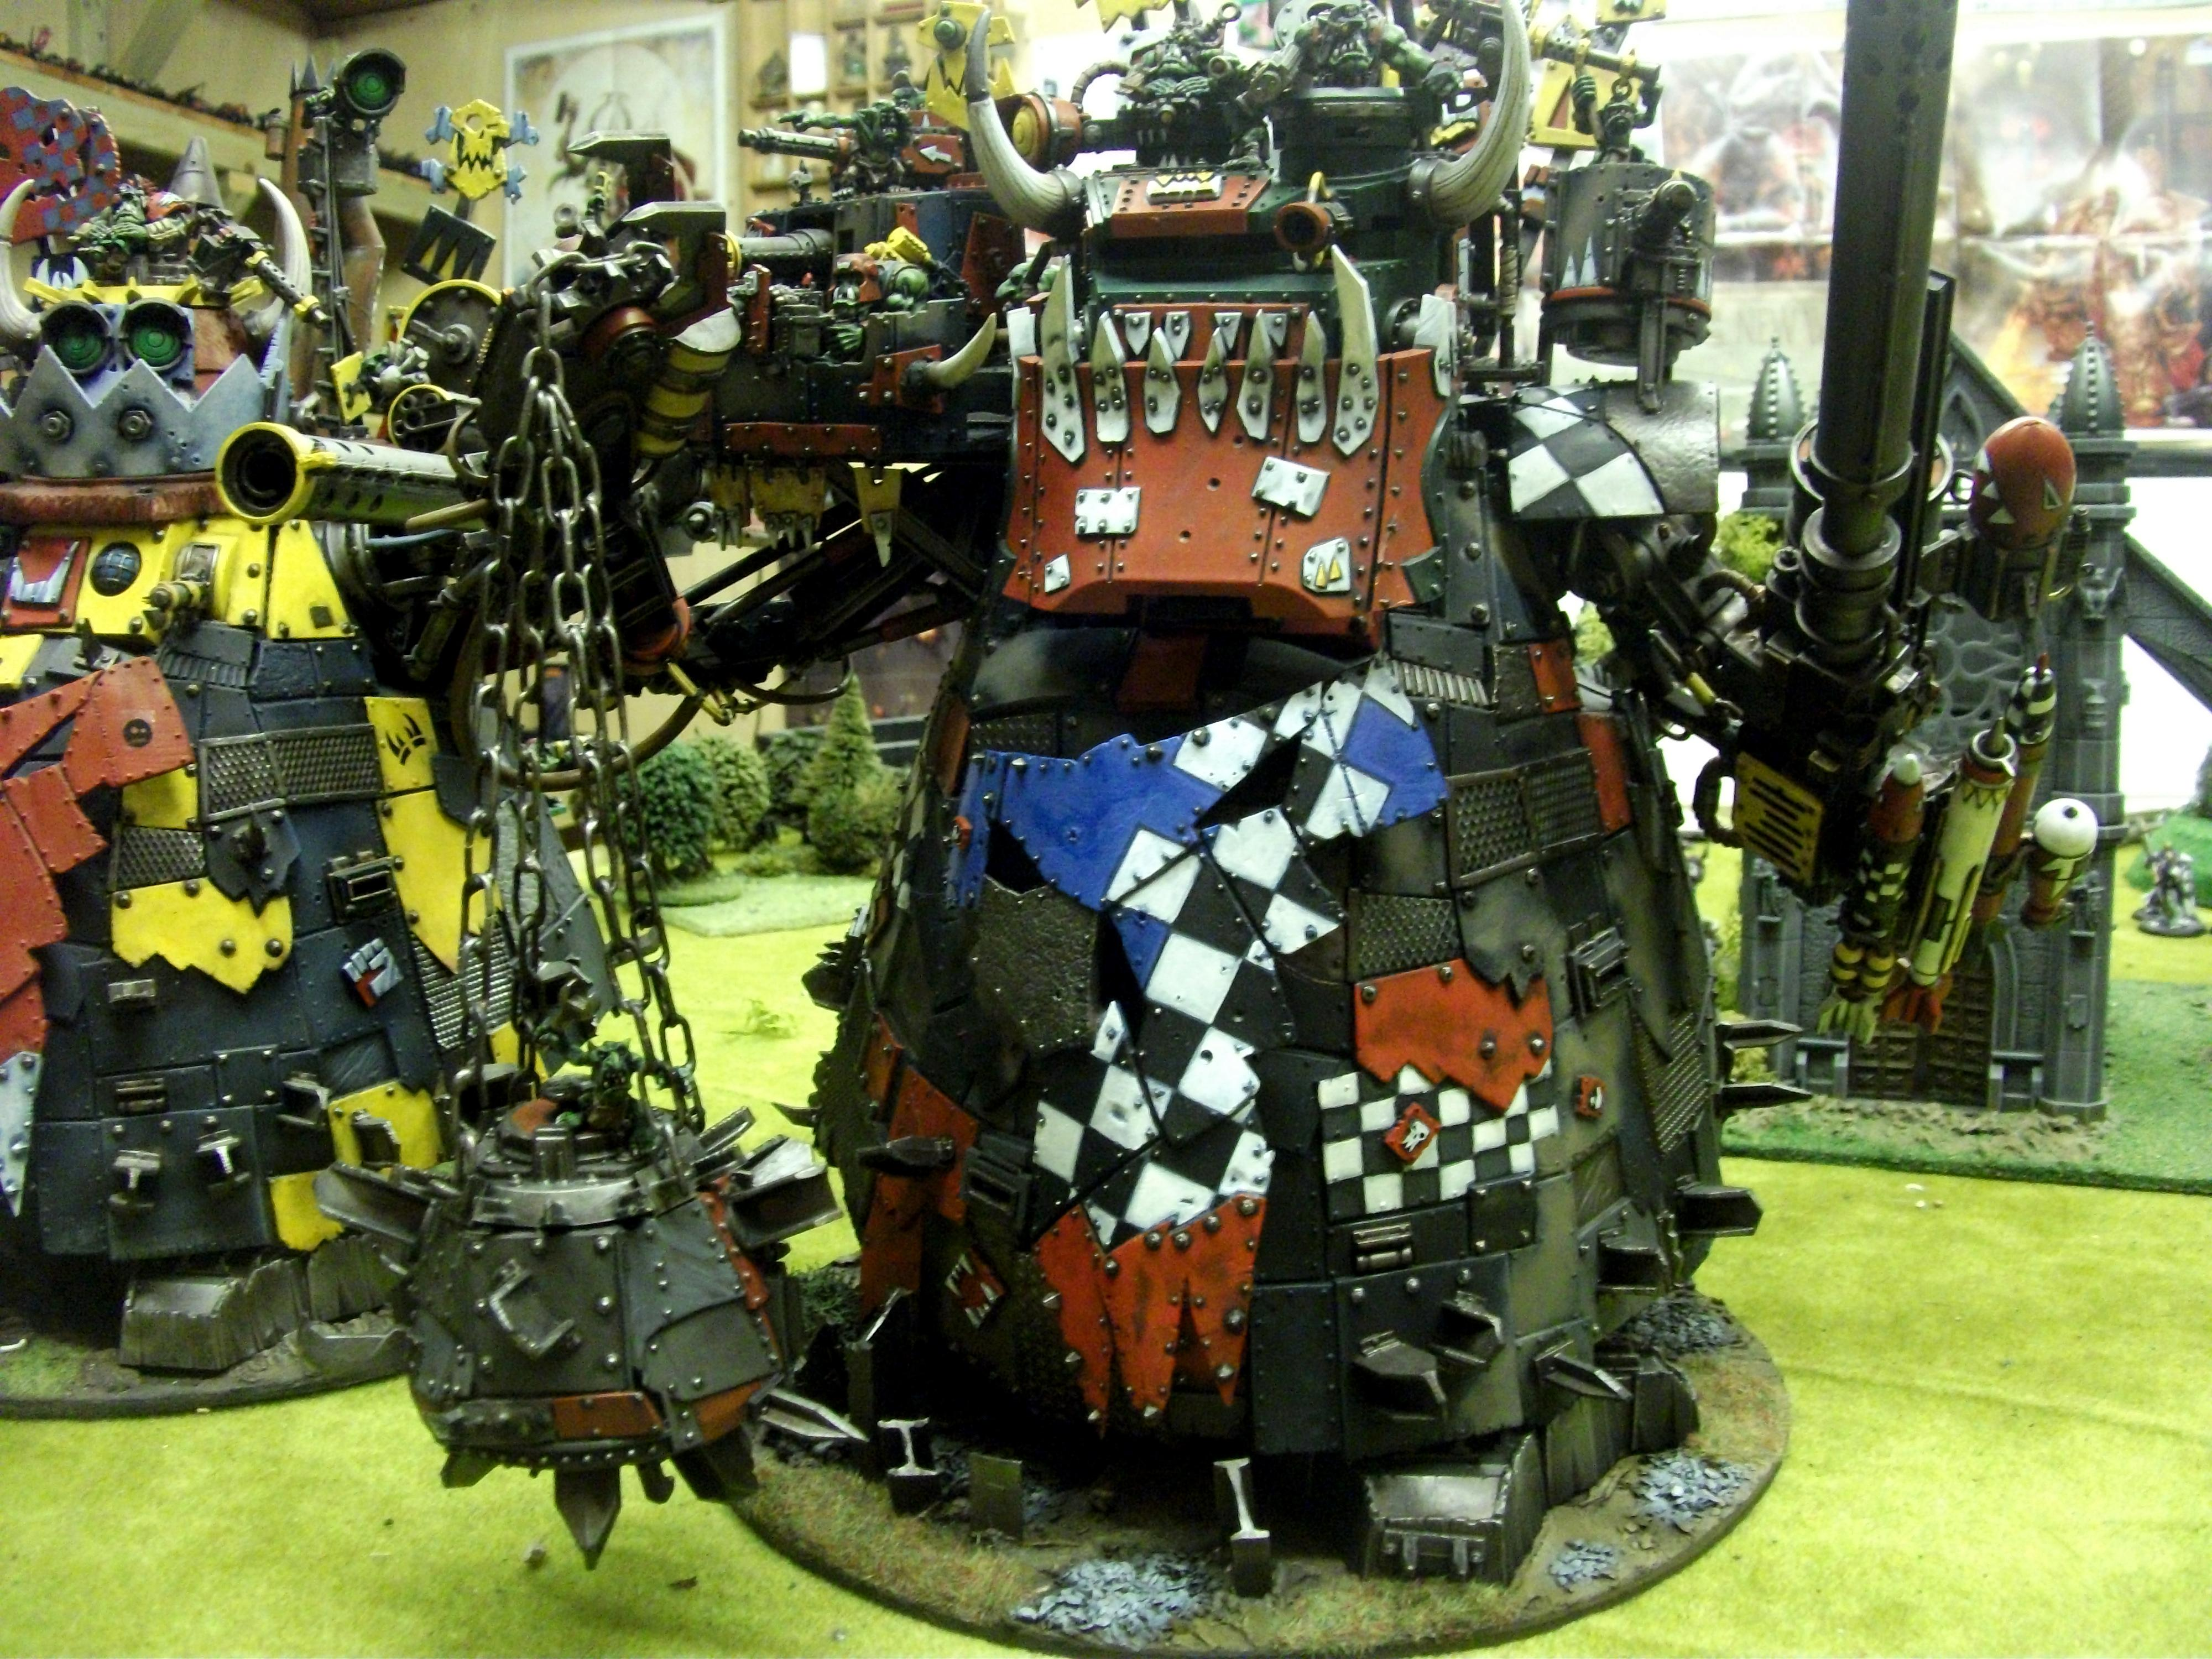 Ork Stompa, Orks, Stompa, Warhammer 40,000